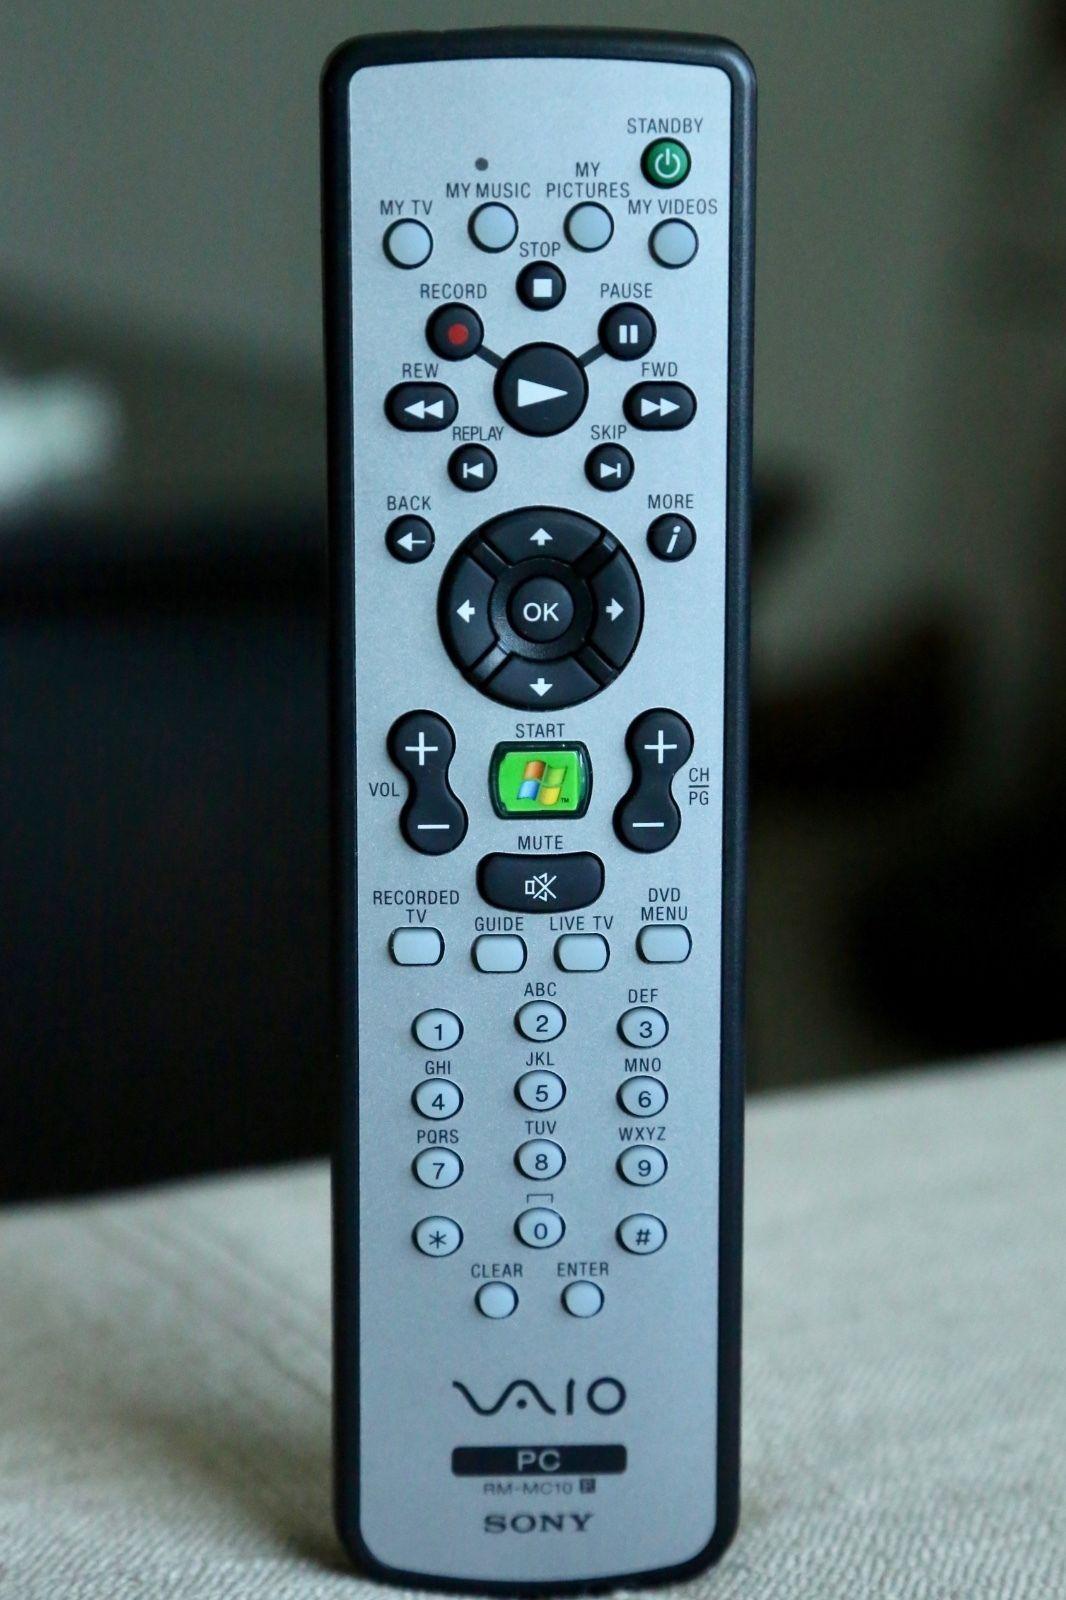 Sony Vaio PC RM-MC10 Remote